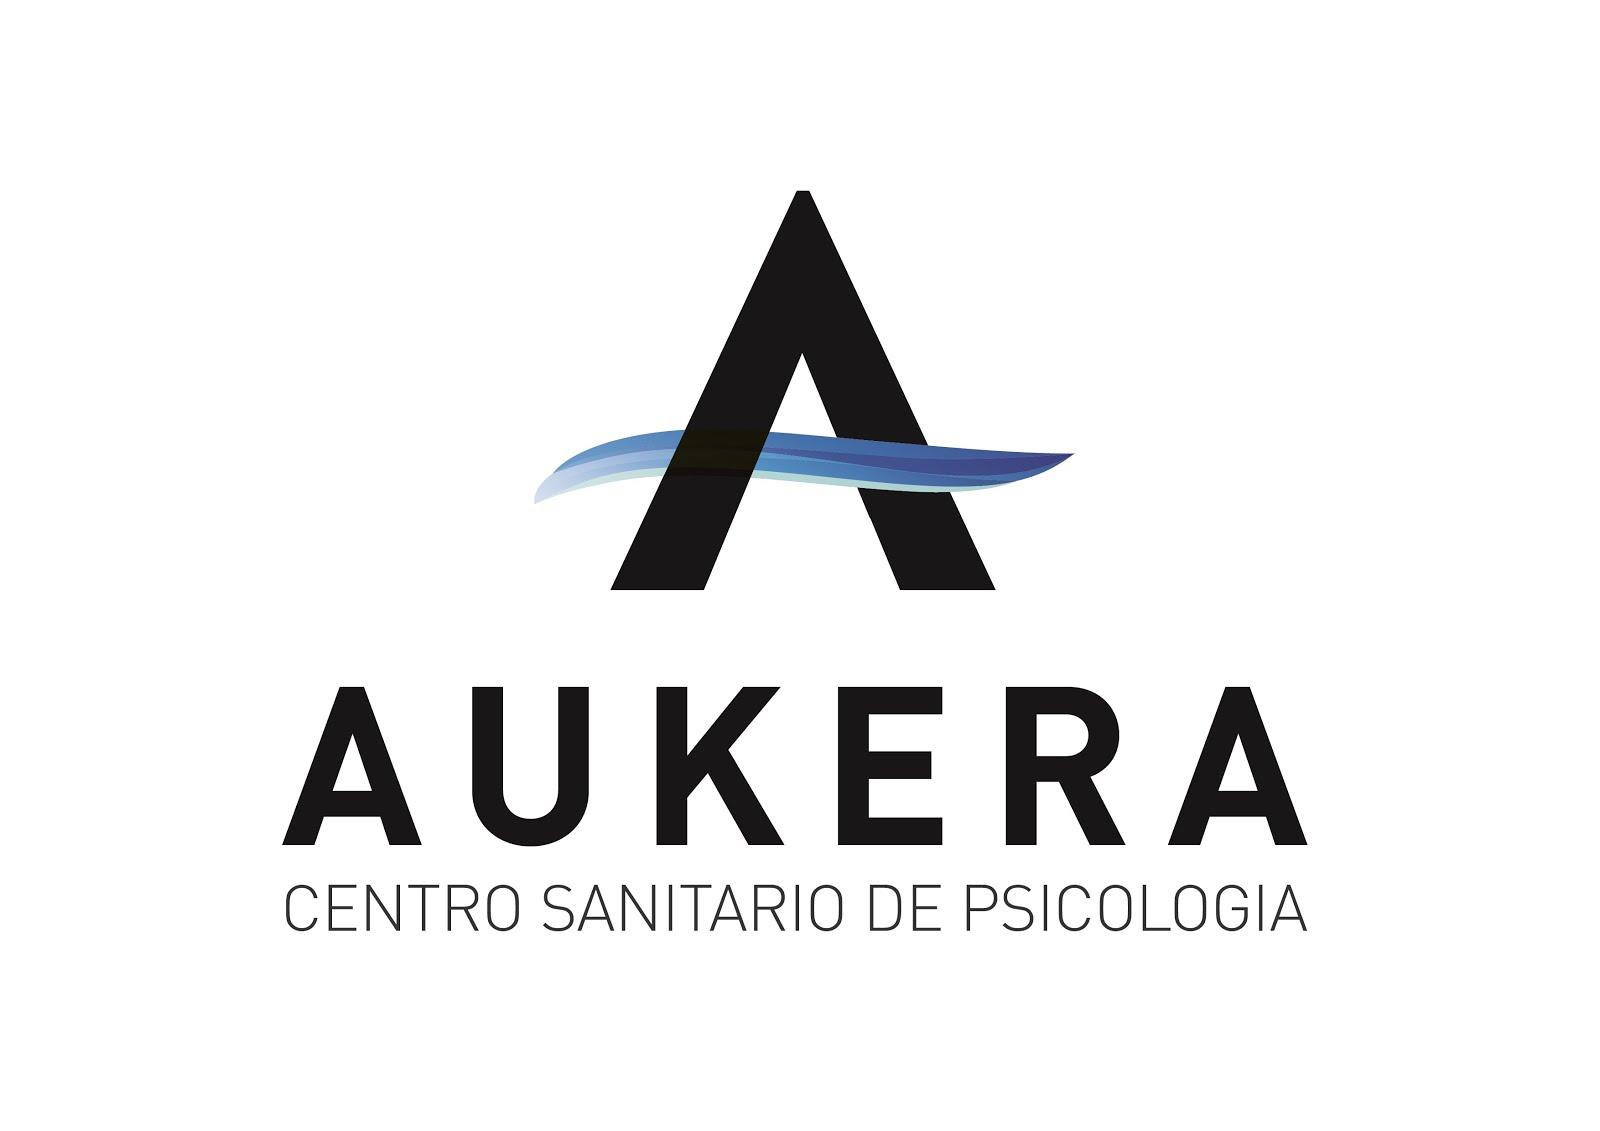 Centro de psicología AUKERA